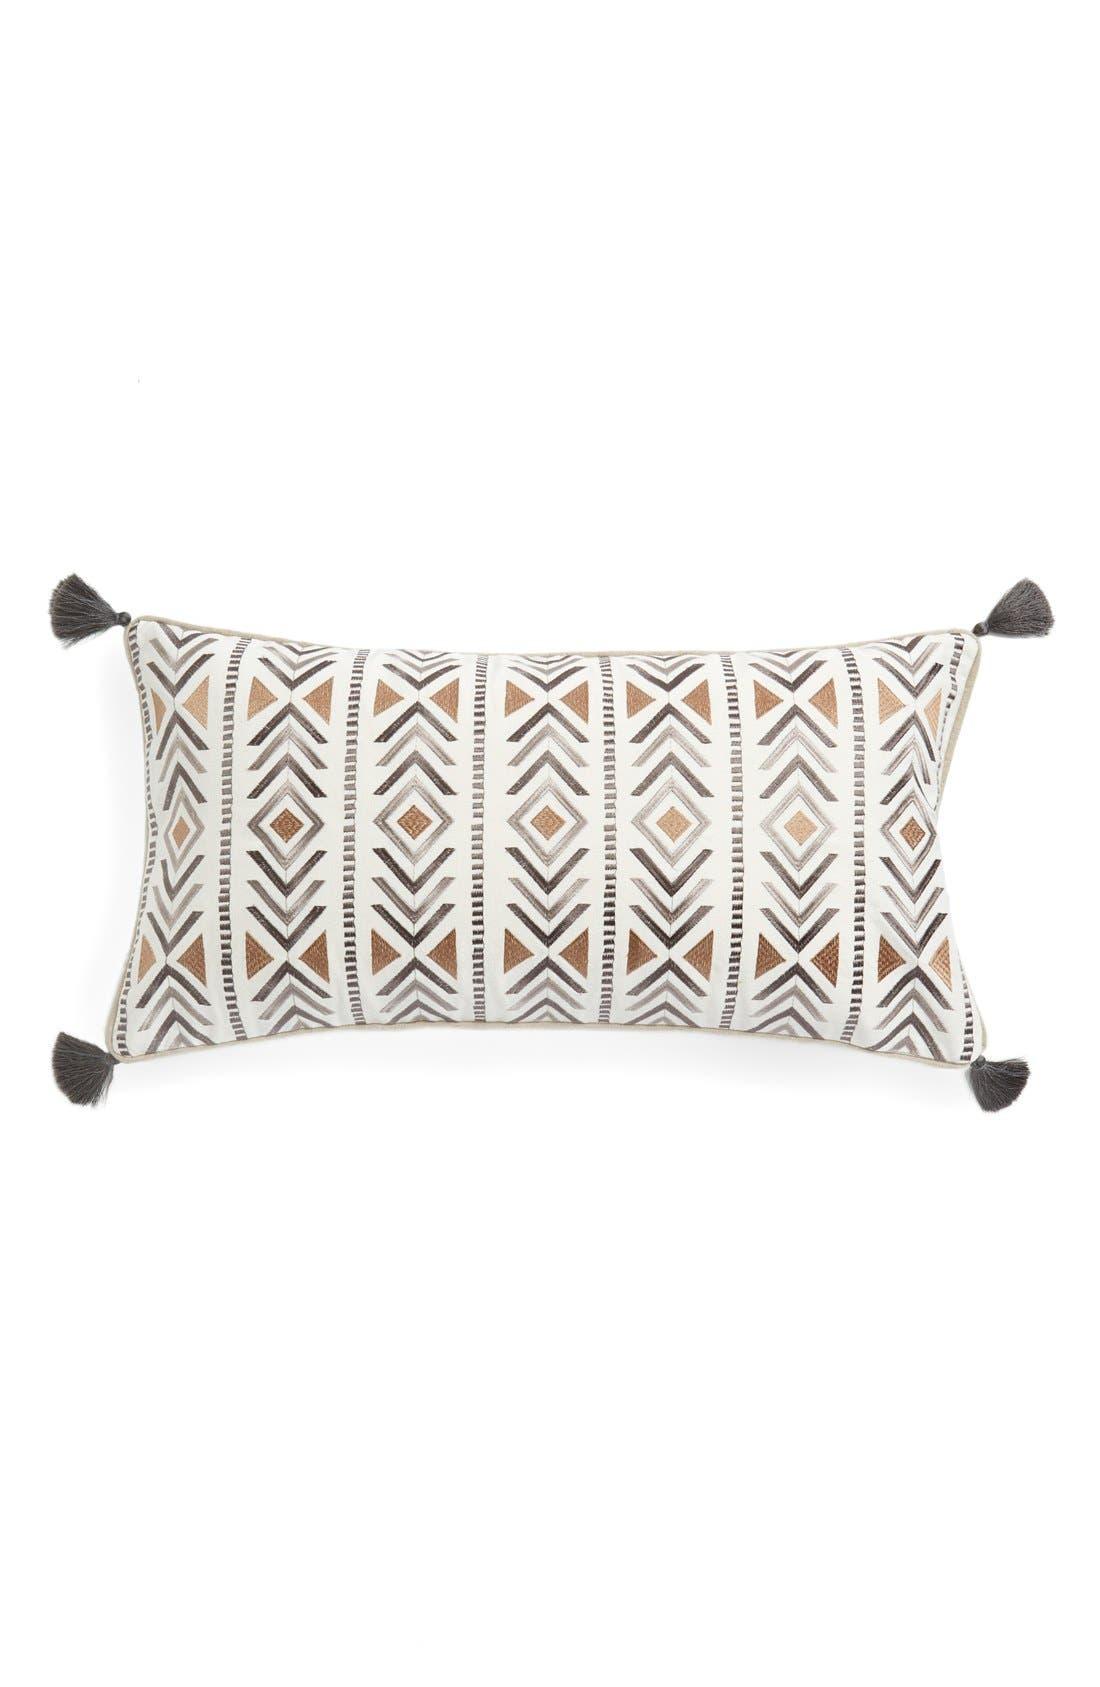 Main Image - Levtex'Santa Fe' Tassel Pillow